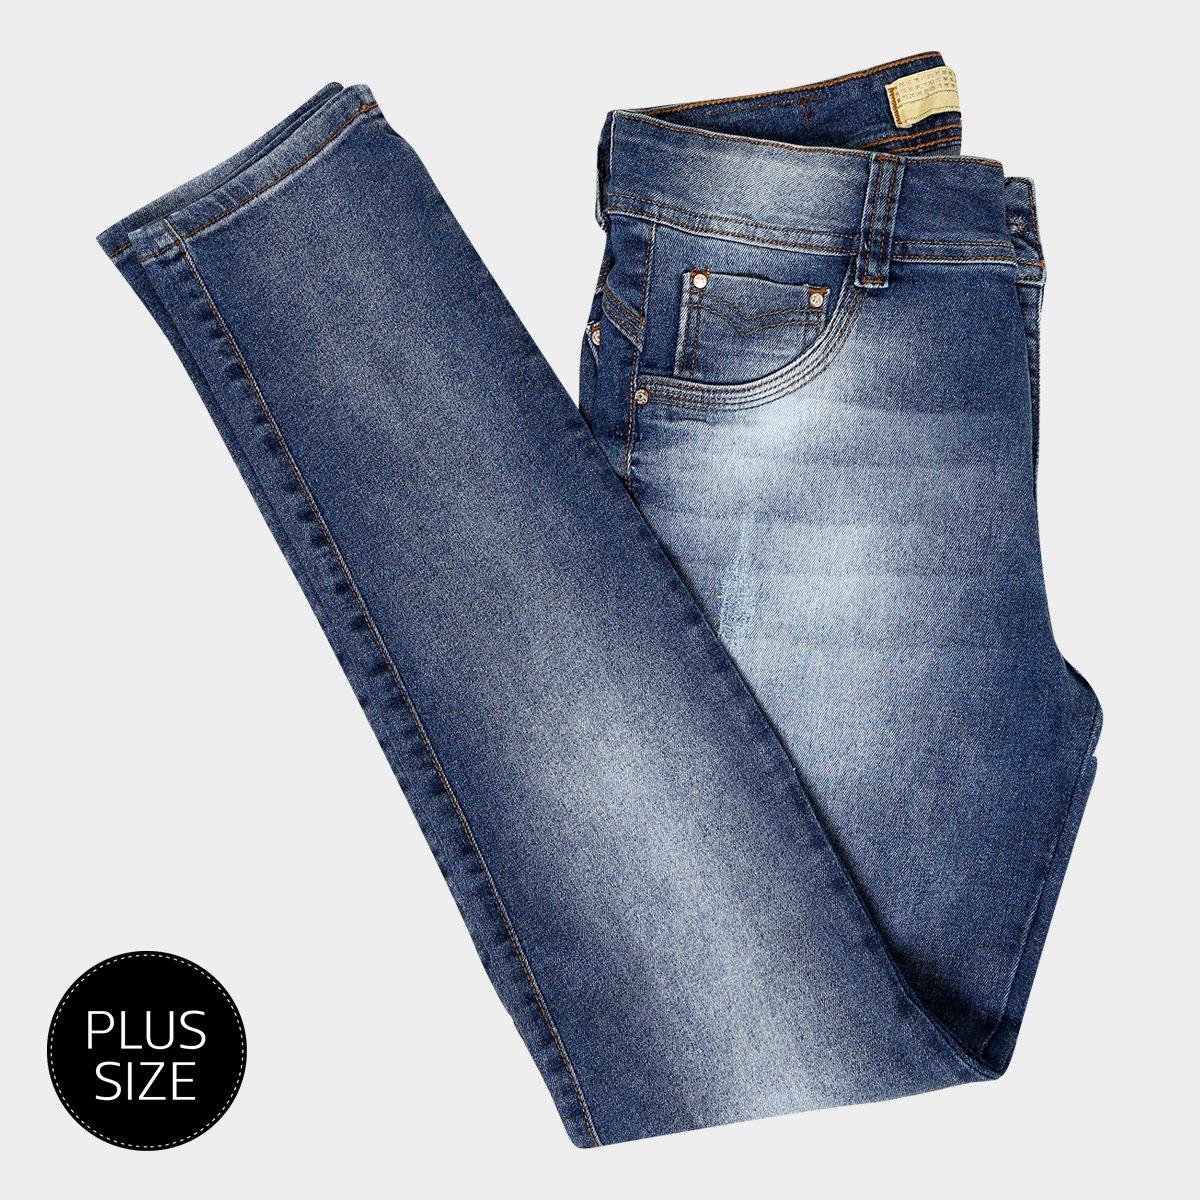 9ac7d5d87 Calça Jeans Skinny Biotipo Estonada Cintura Alta Plus Size Feminina -  Compre Agora